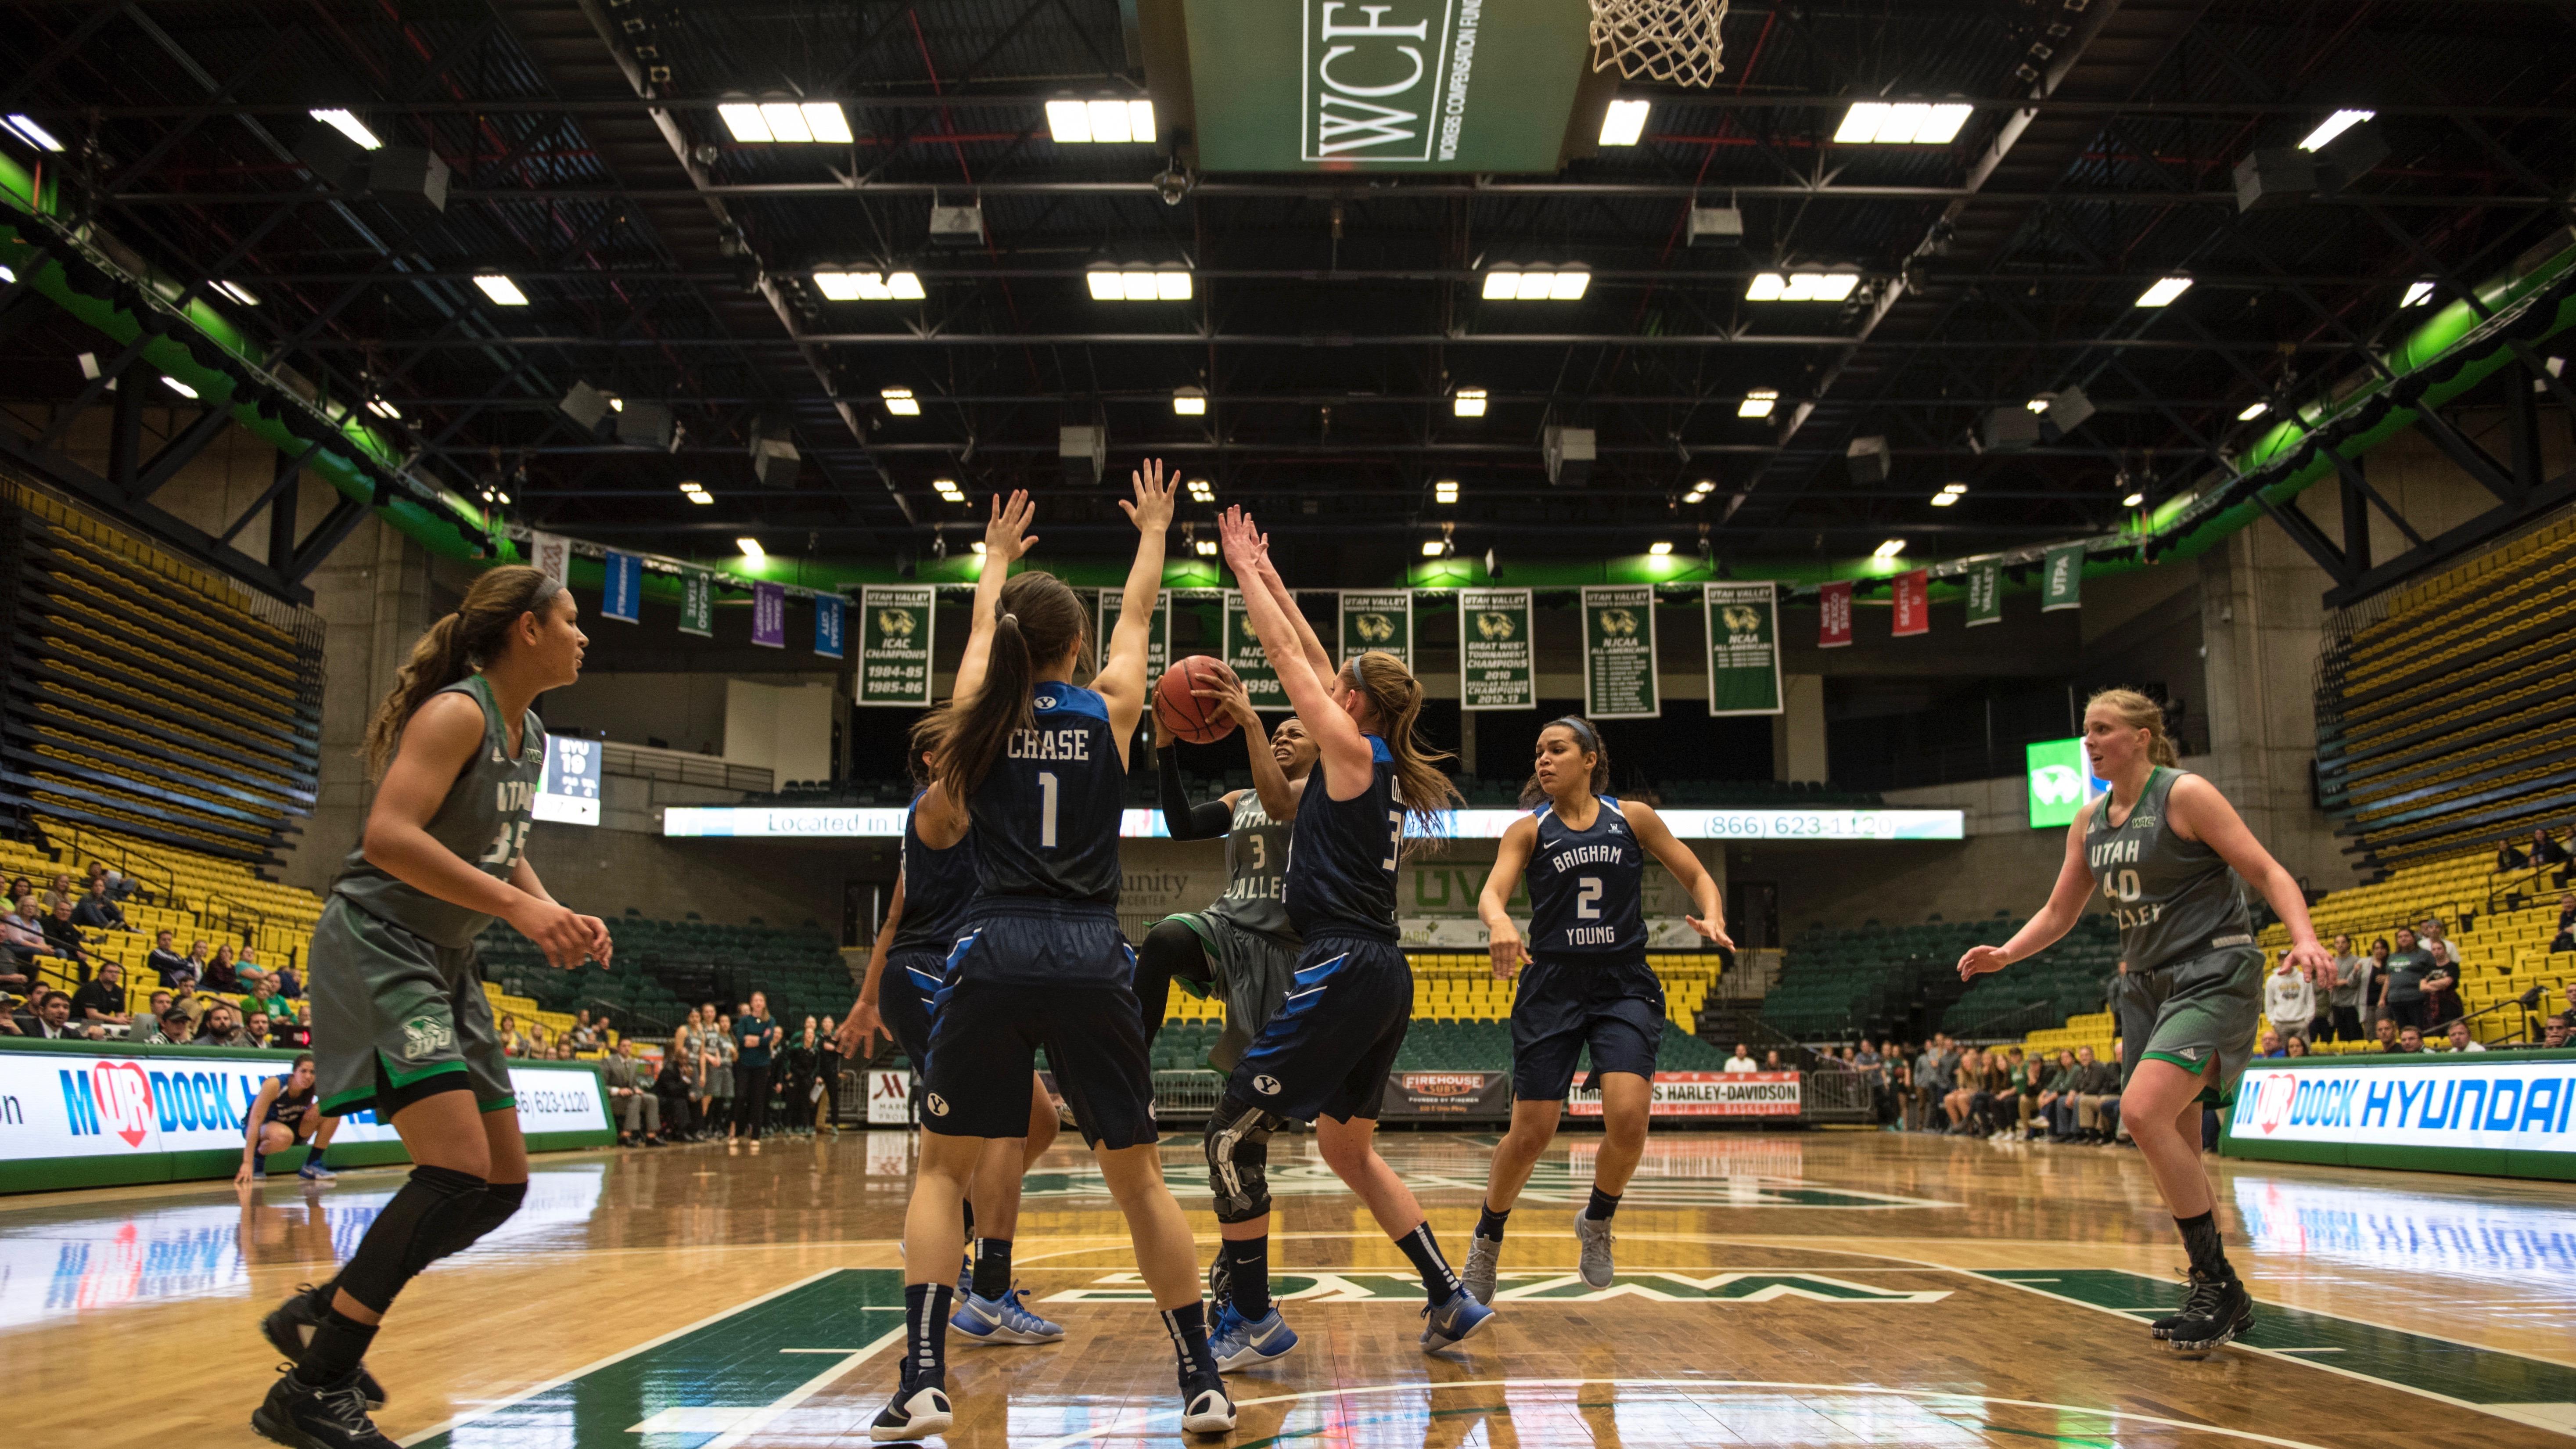 Women's basketball: UVU vs GCU: Five takeaways